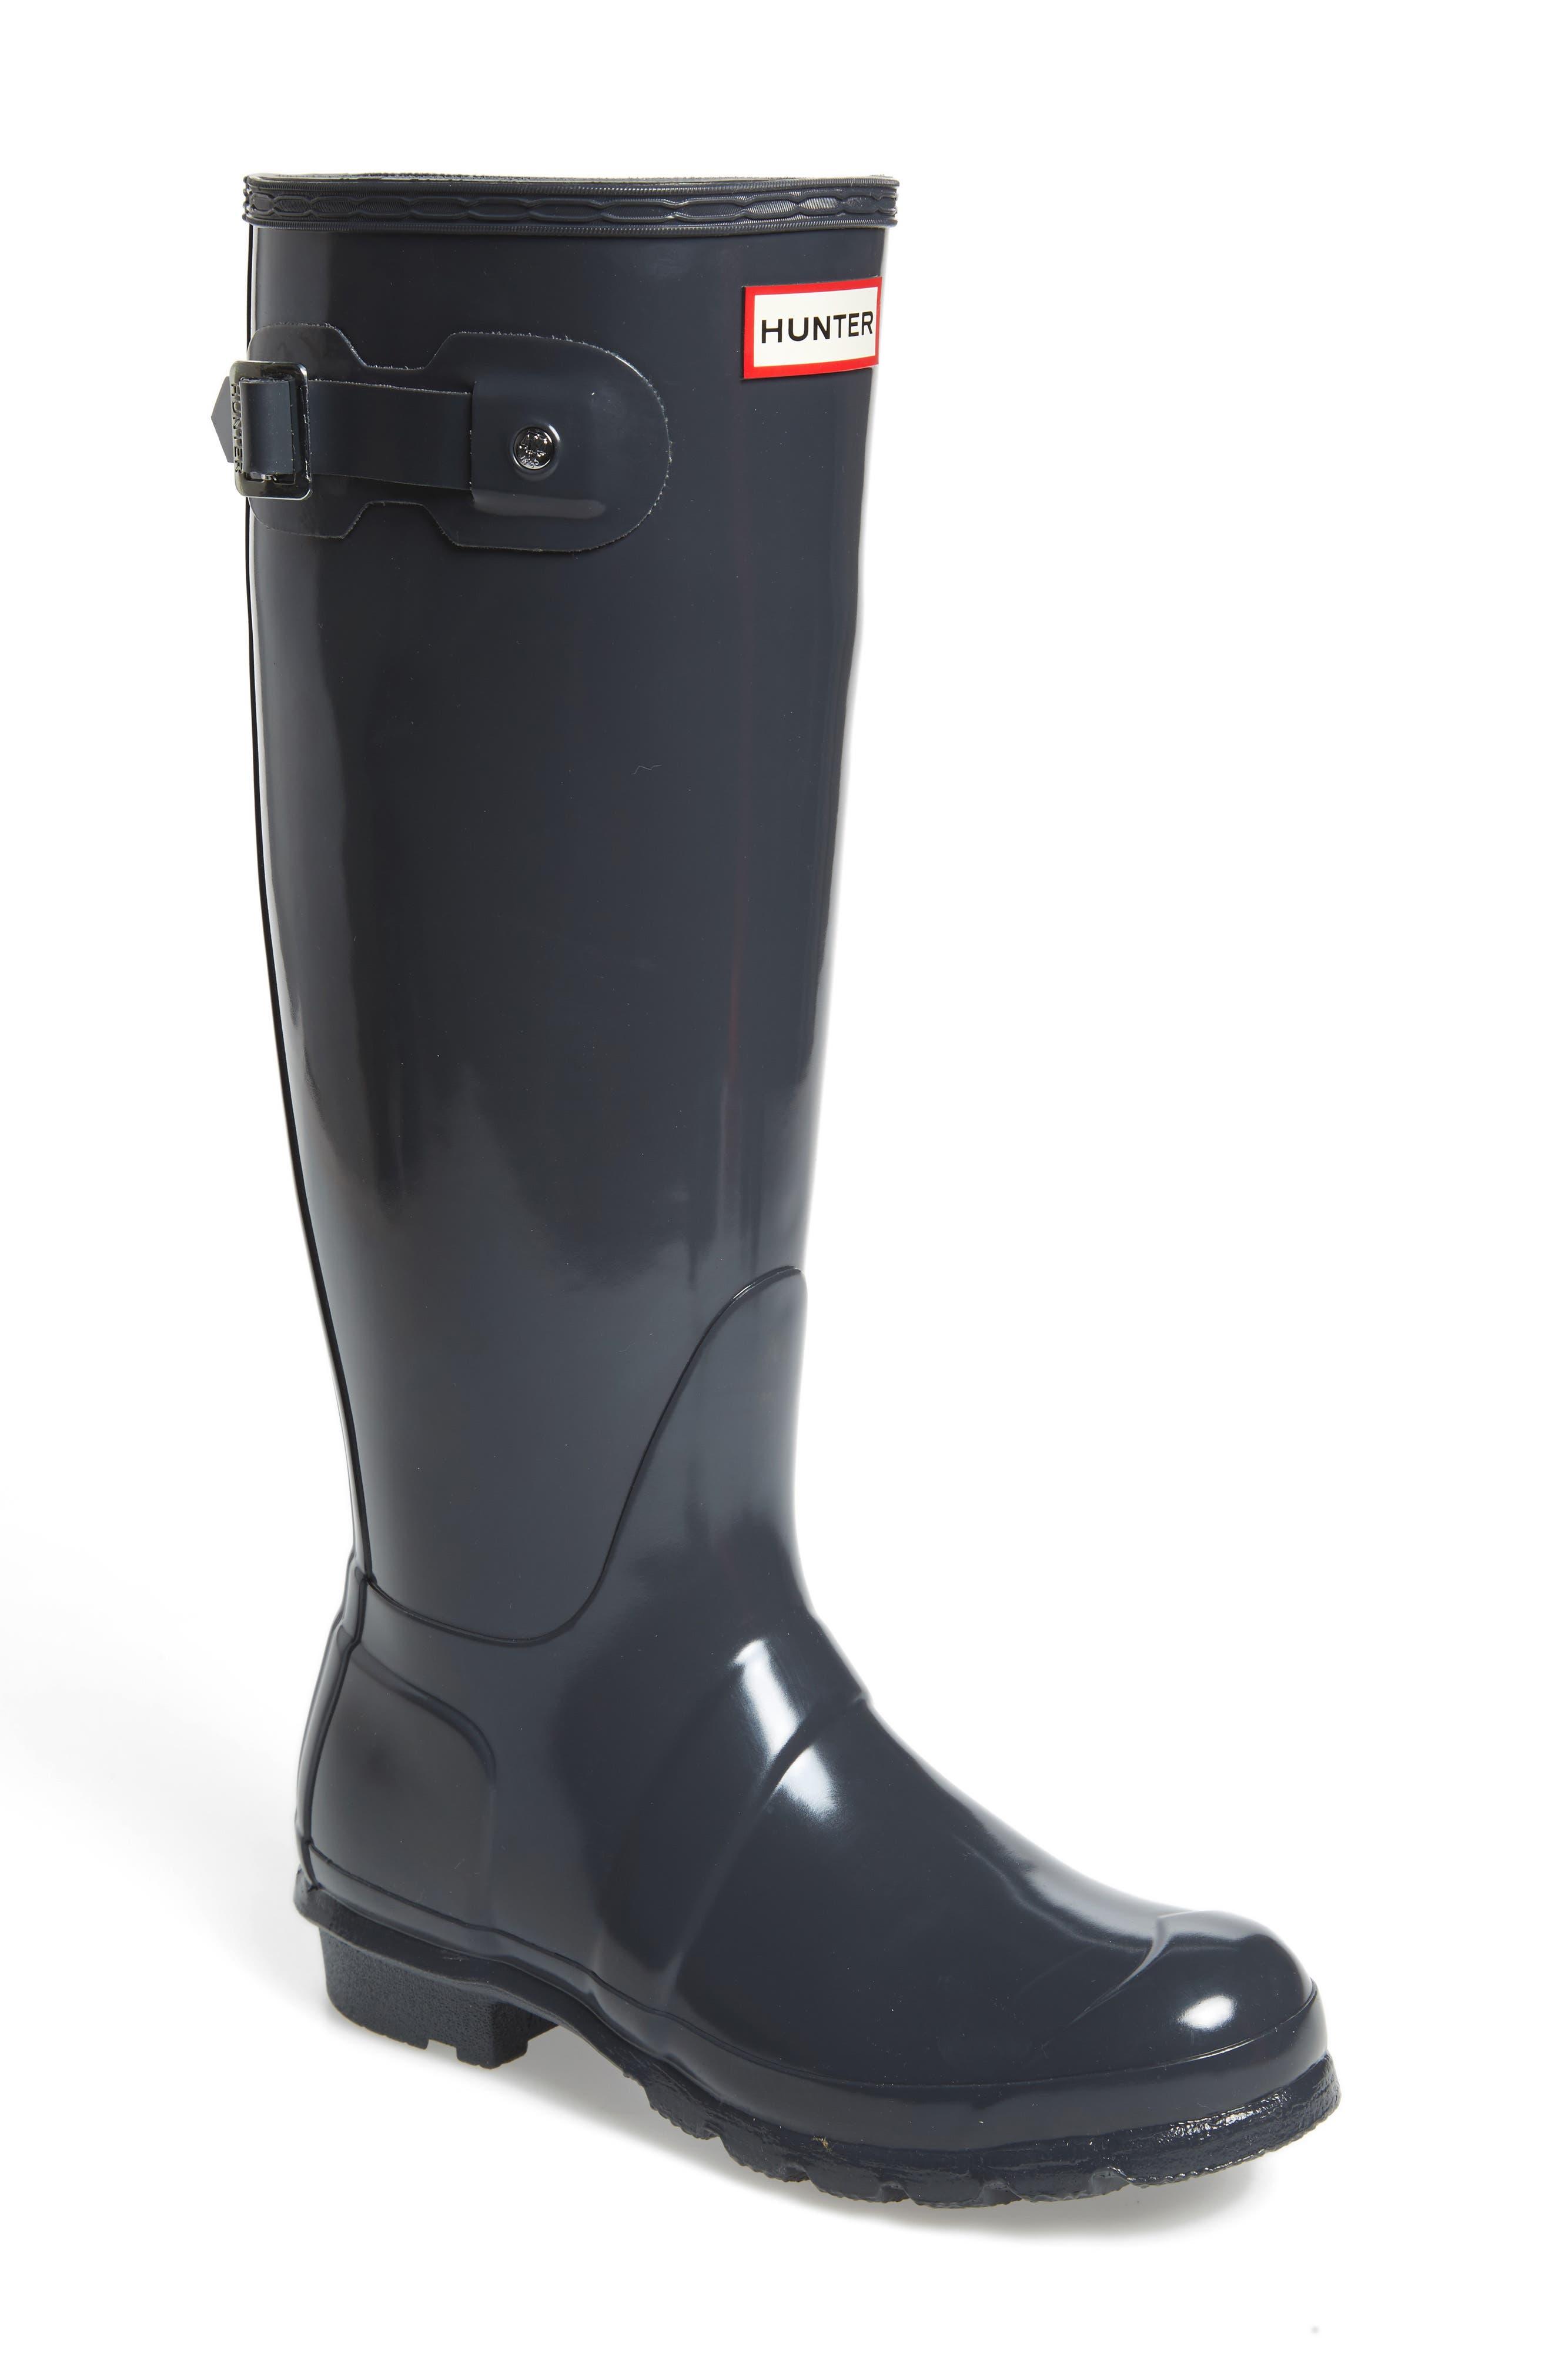 Image of Hunter Original High Gloss Waterproof Boot